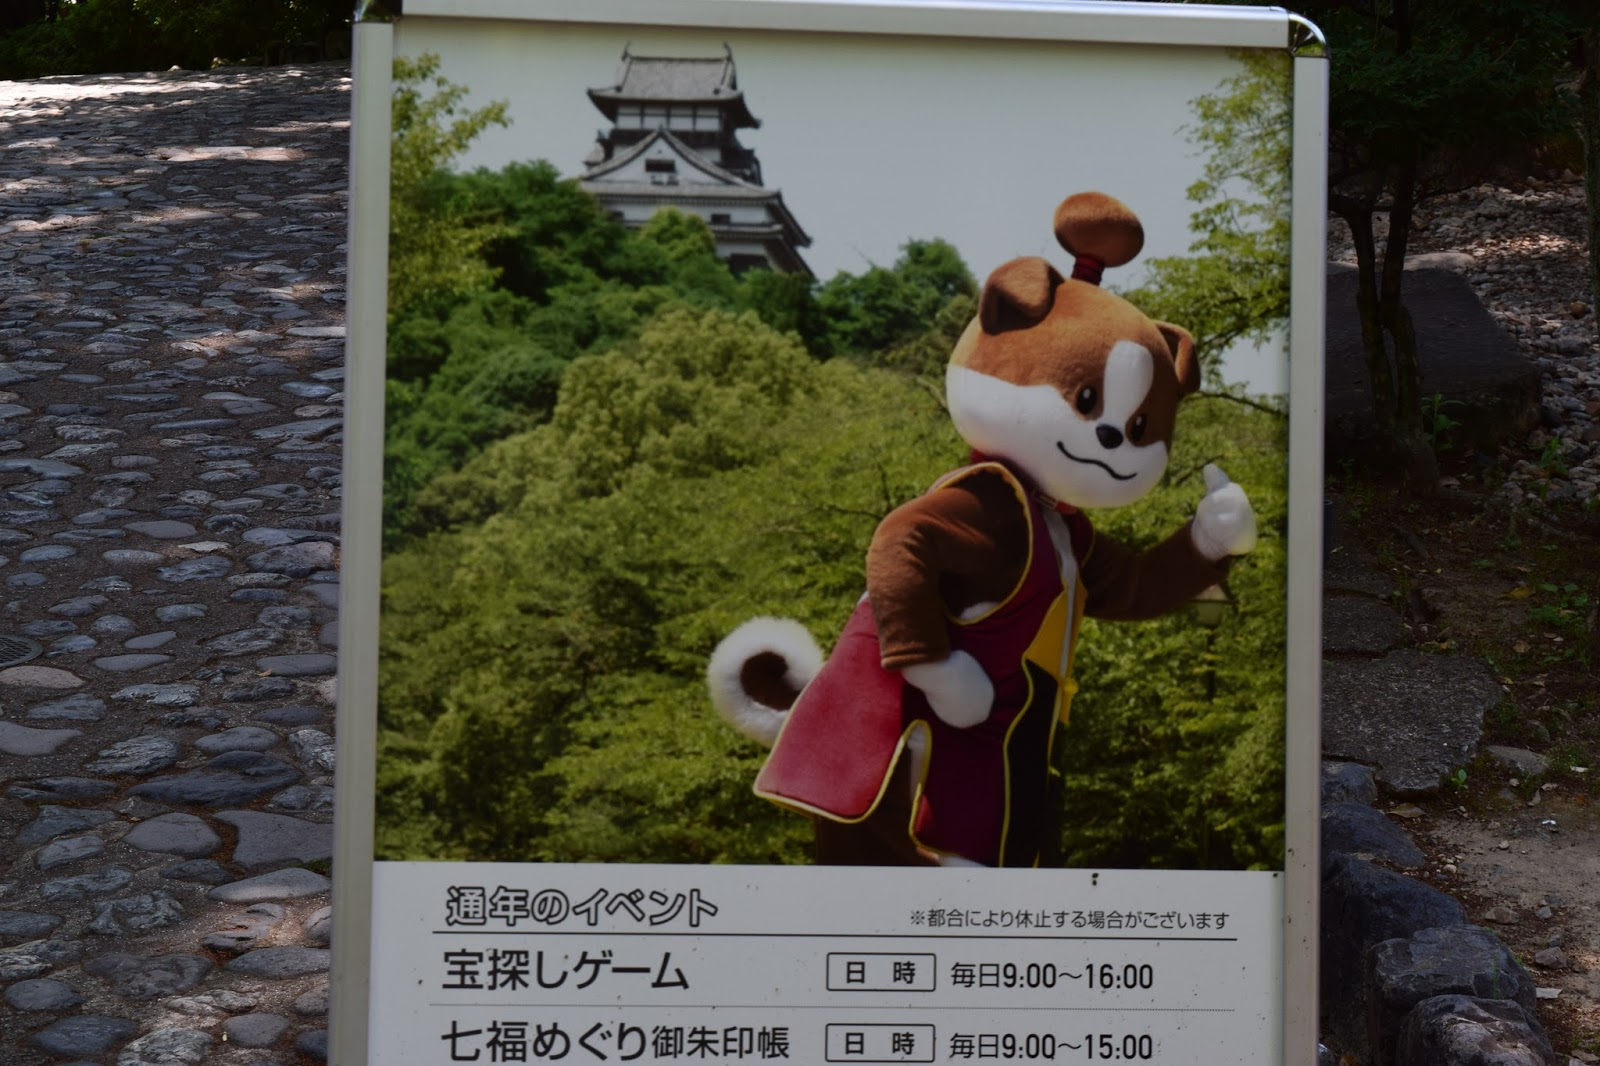 Wanmaru kun Inuyama castle mascot